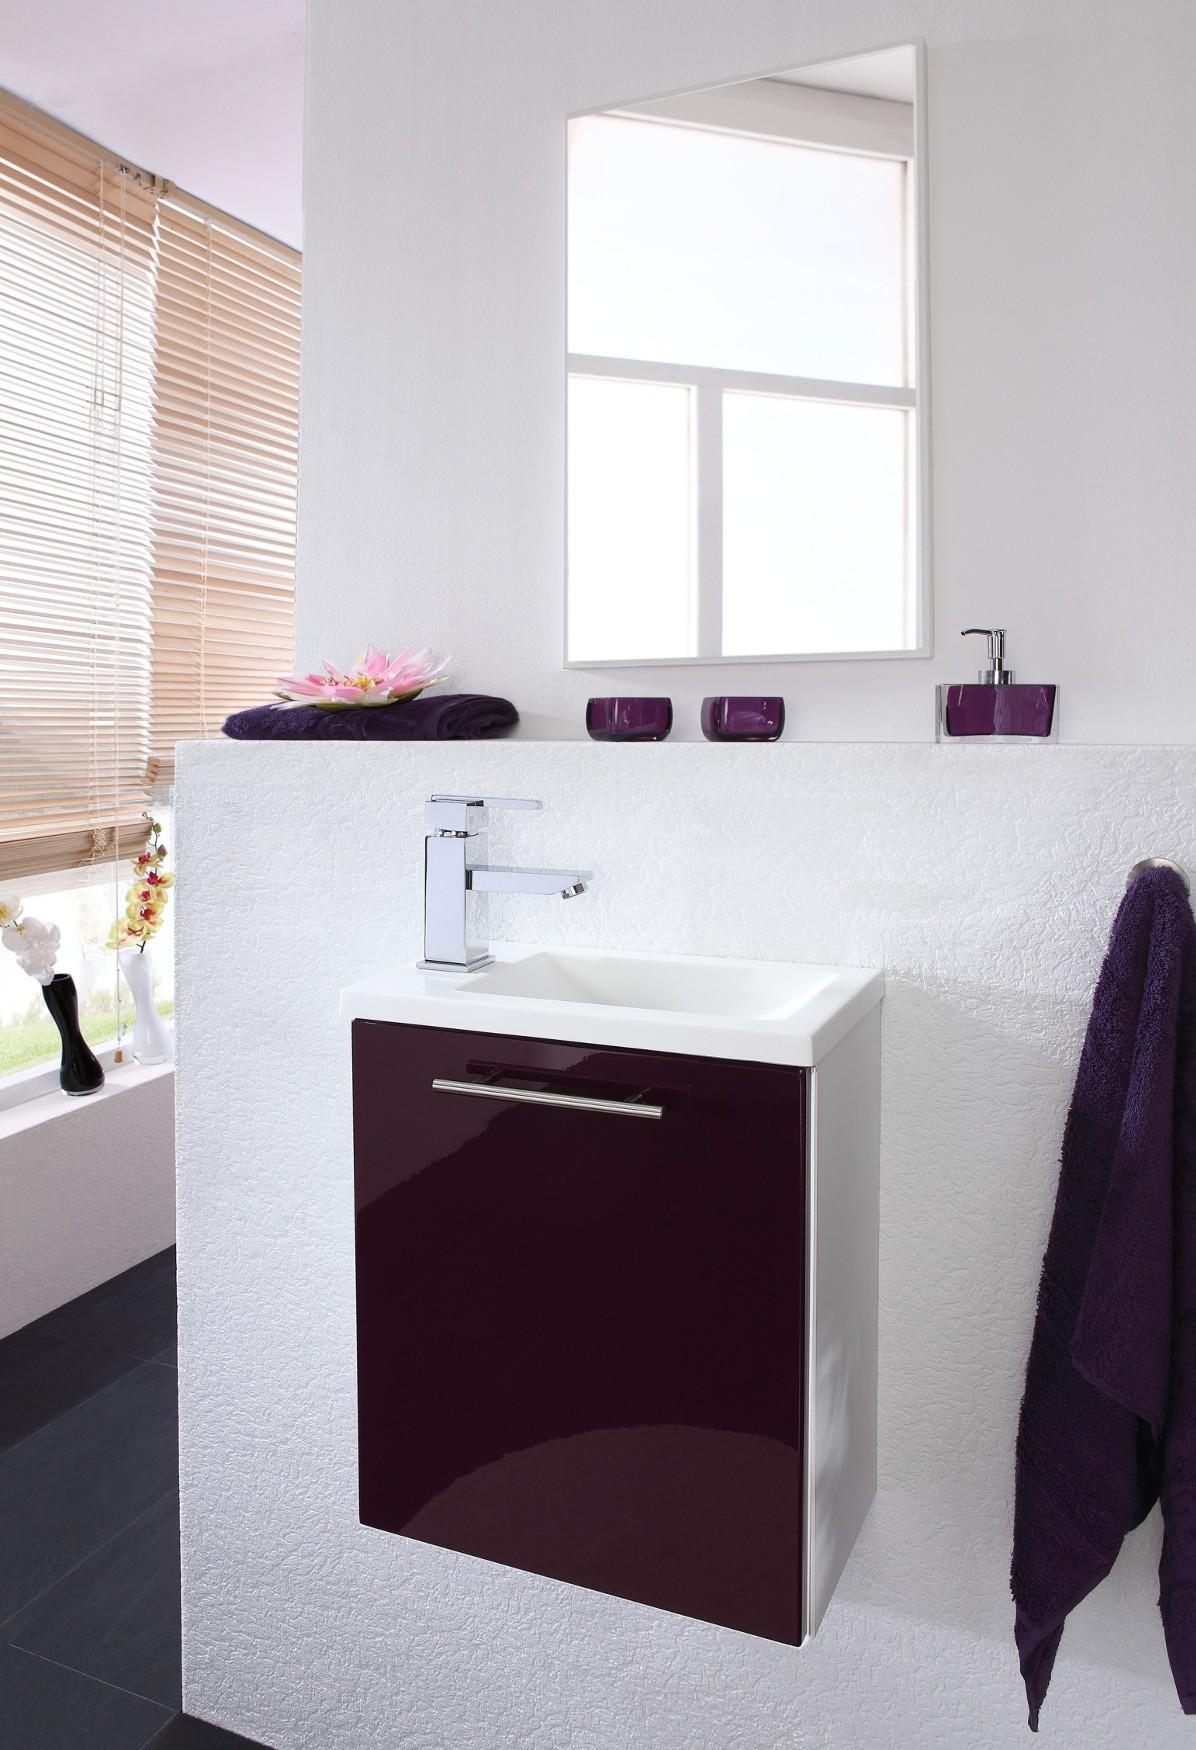 badm bel set alexo mit waschplatz 2 teilig hochglanz brombeer wei bad badm belsets. Black Bedroom Furniture Sets. Home Design Ideas